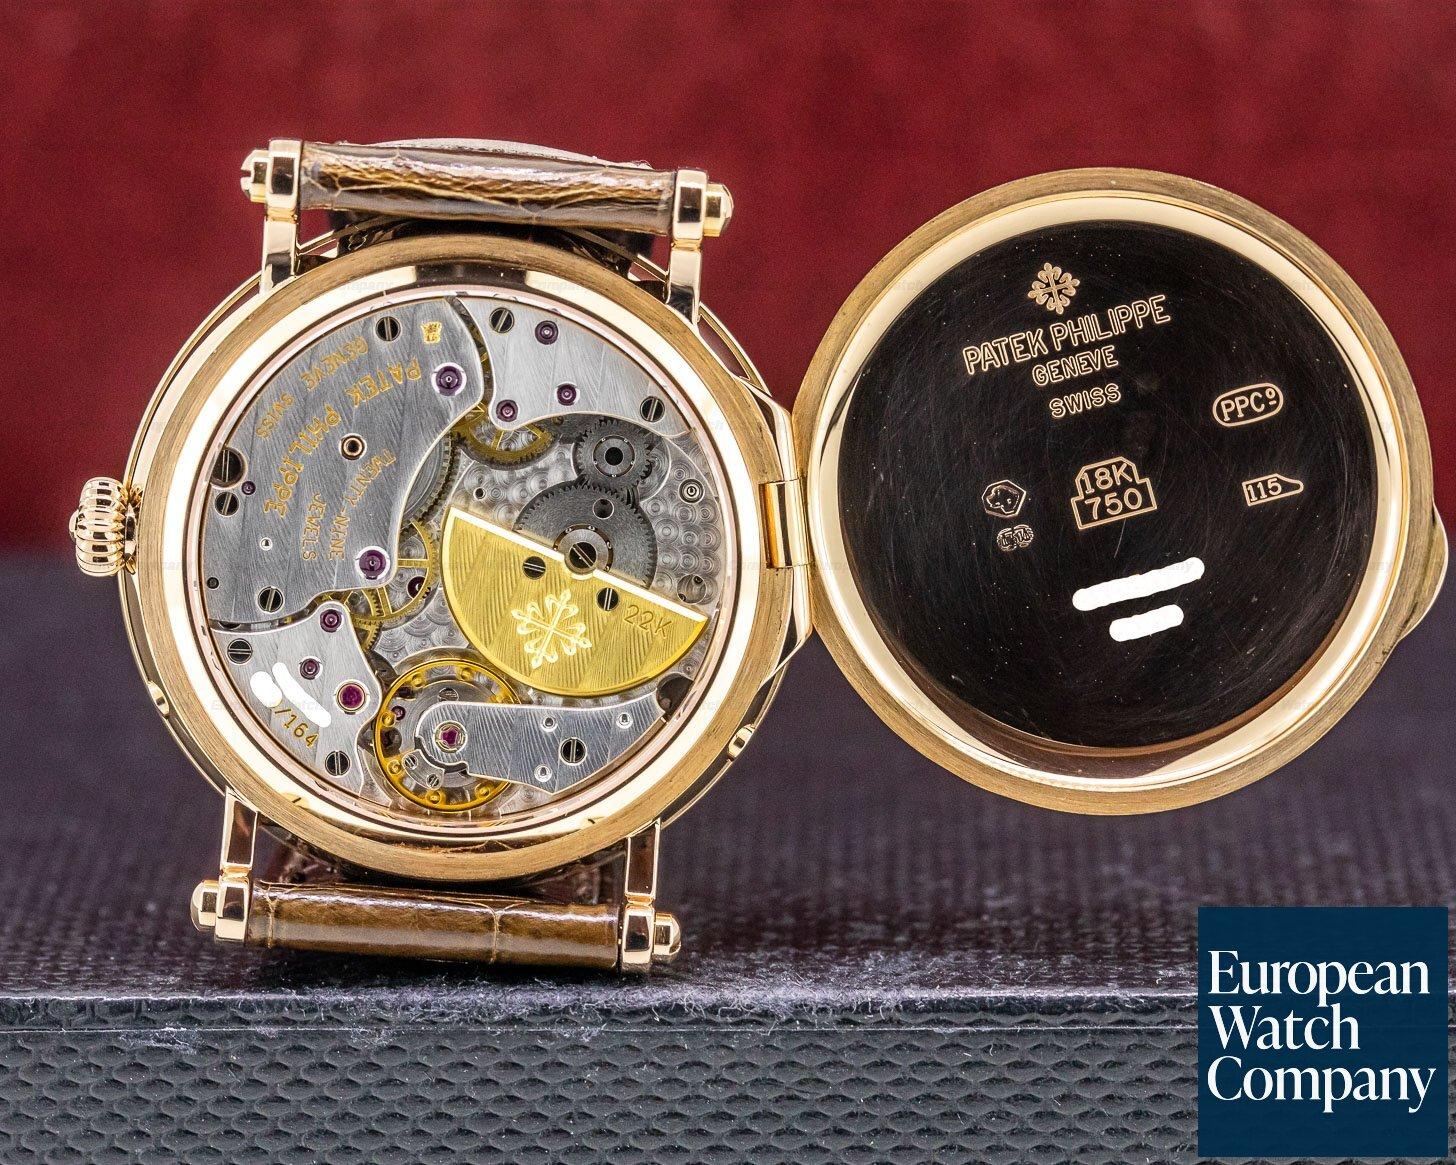 Patek Philippe 5054R-001 Power Reserve Moonphase 18K Rose Gold